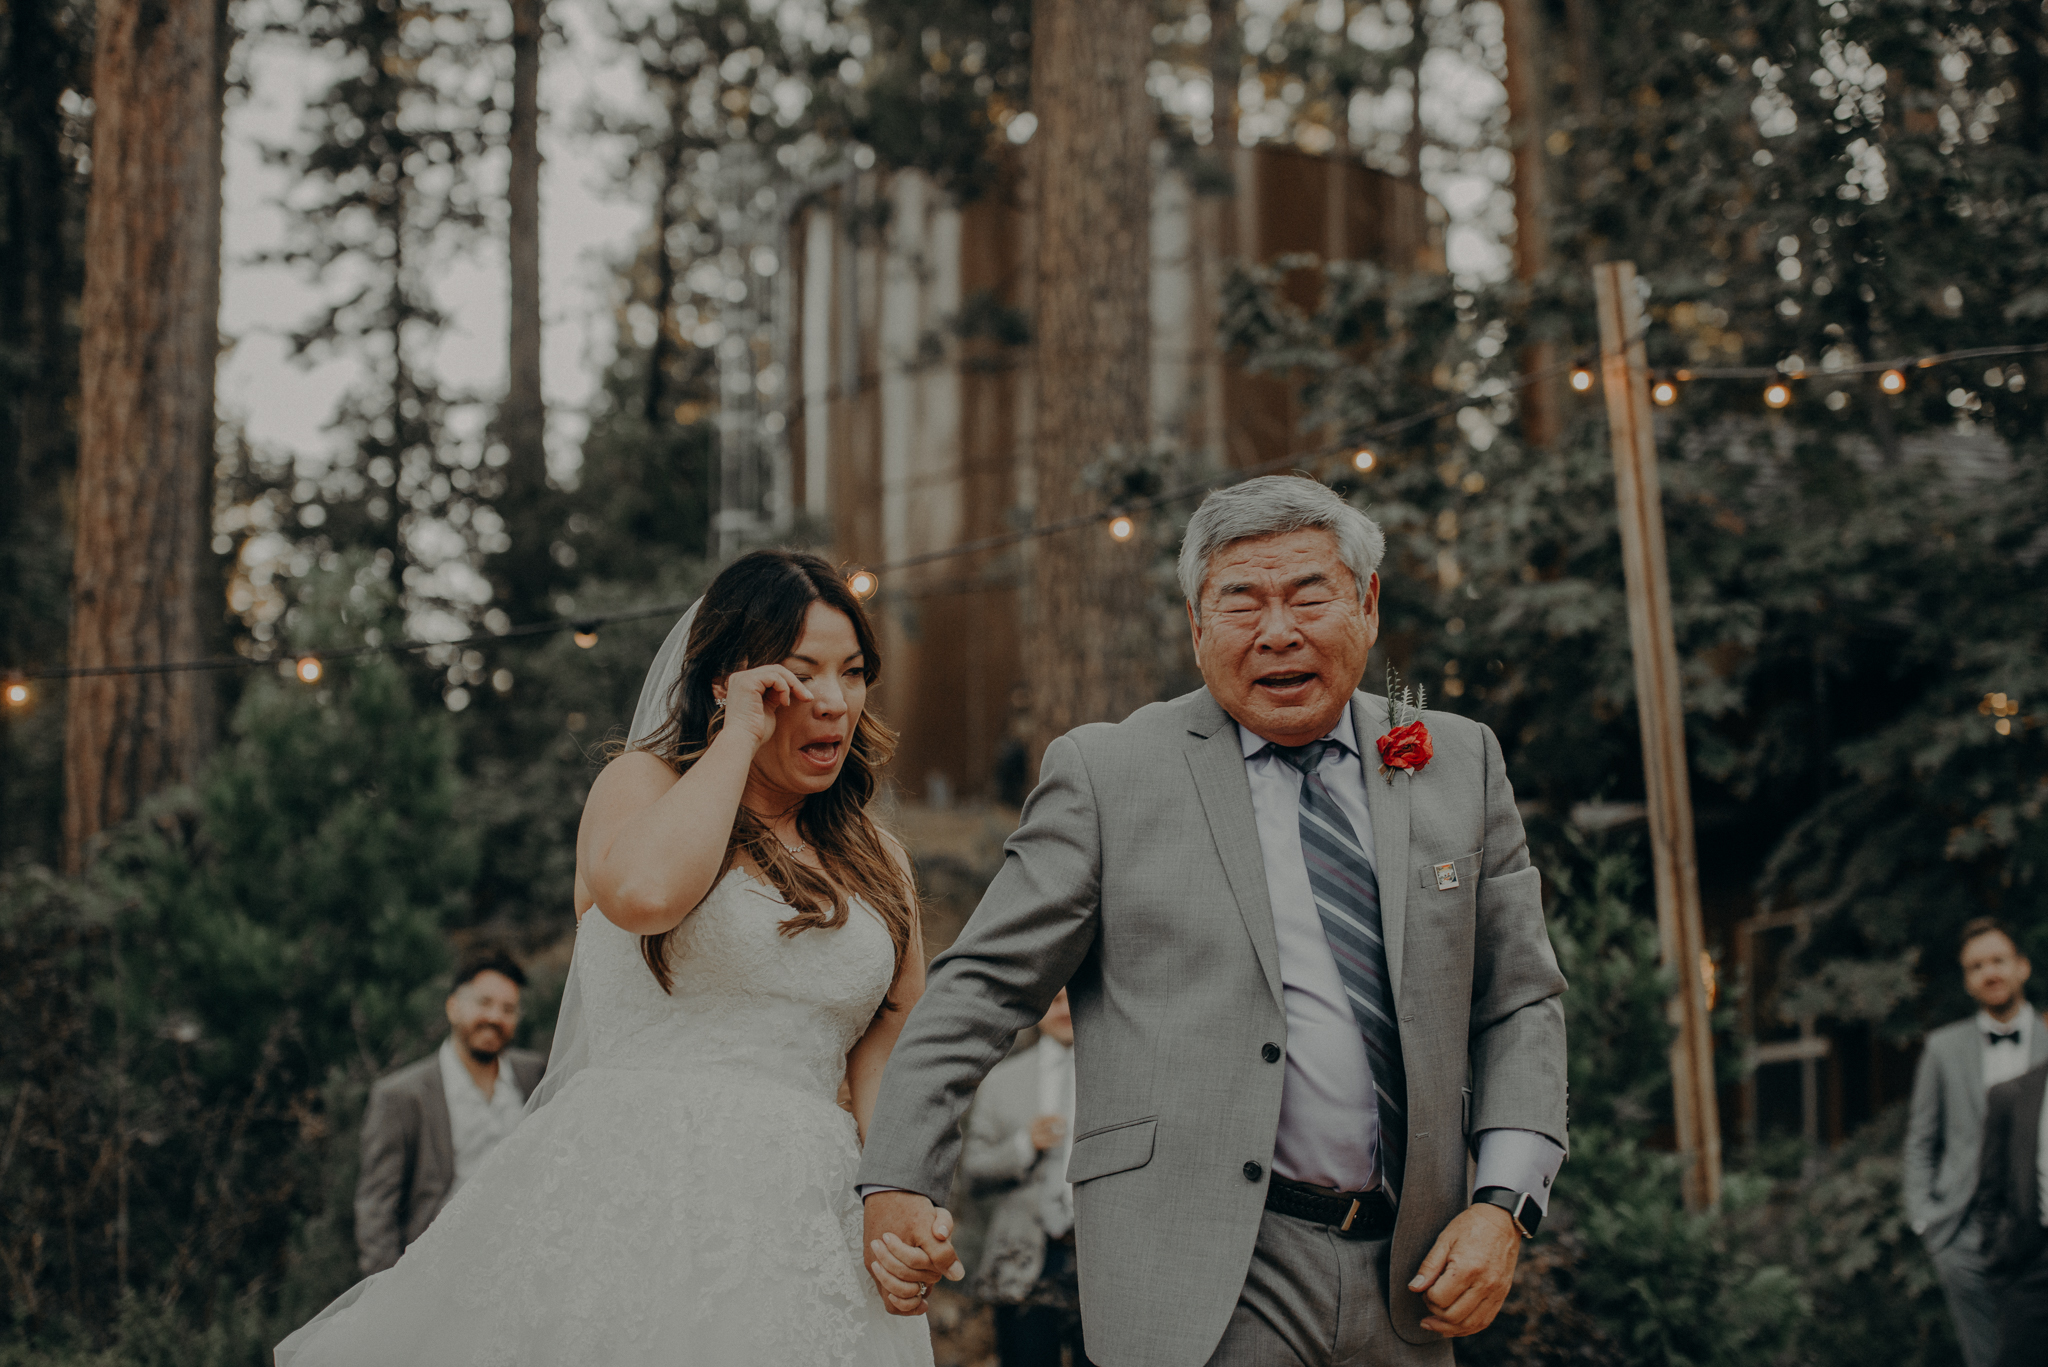 Yosemite Elopement Photographer - Evergreen Lodge Wedding Photographer - IsaiahAndTaylor.com-128.jpg